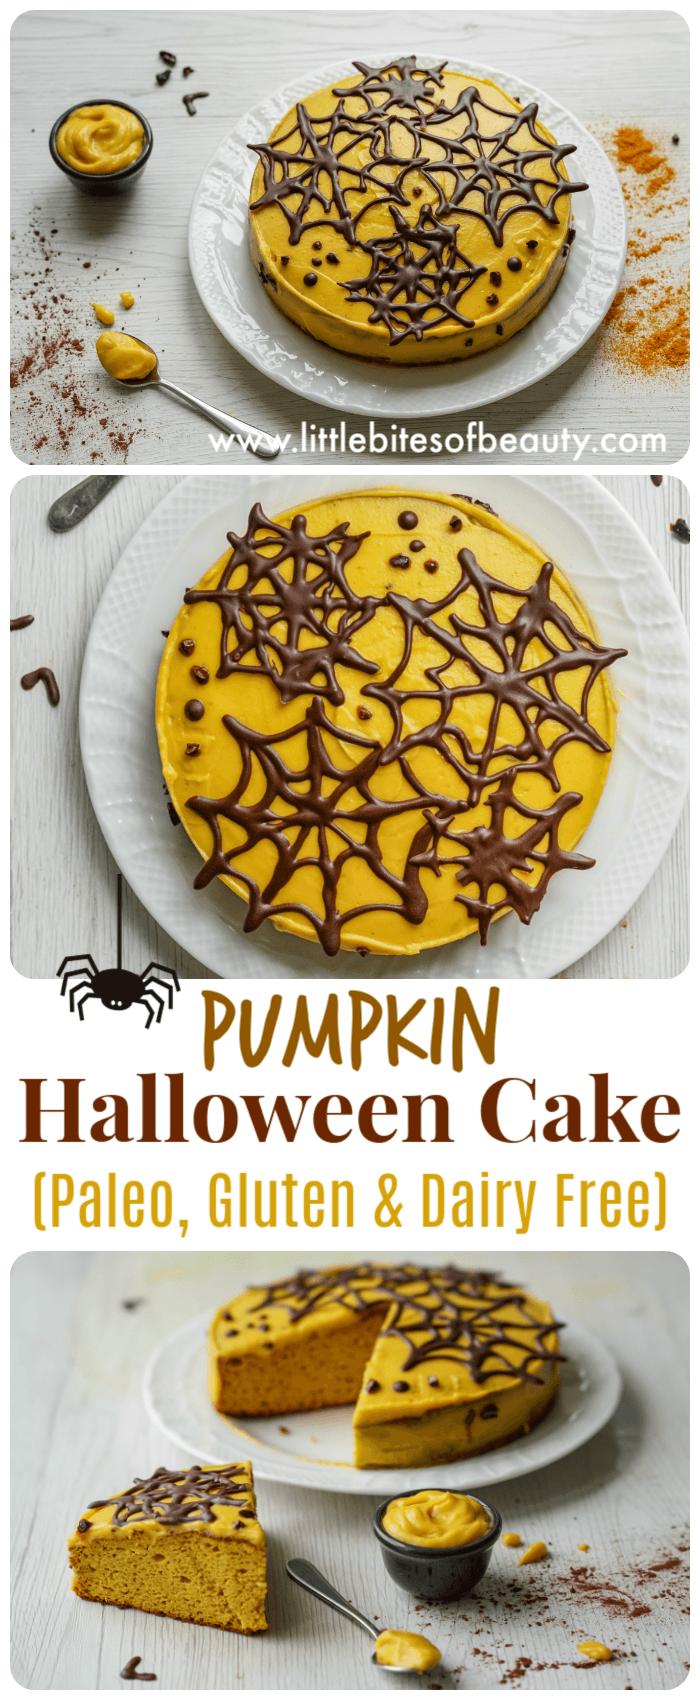 Pumpkin Paleo Halloween Cake (Dairy and Gluten Free)